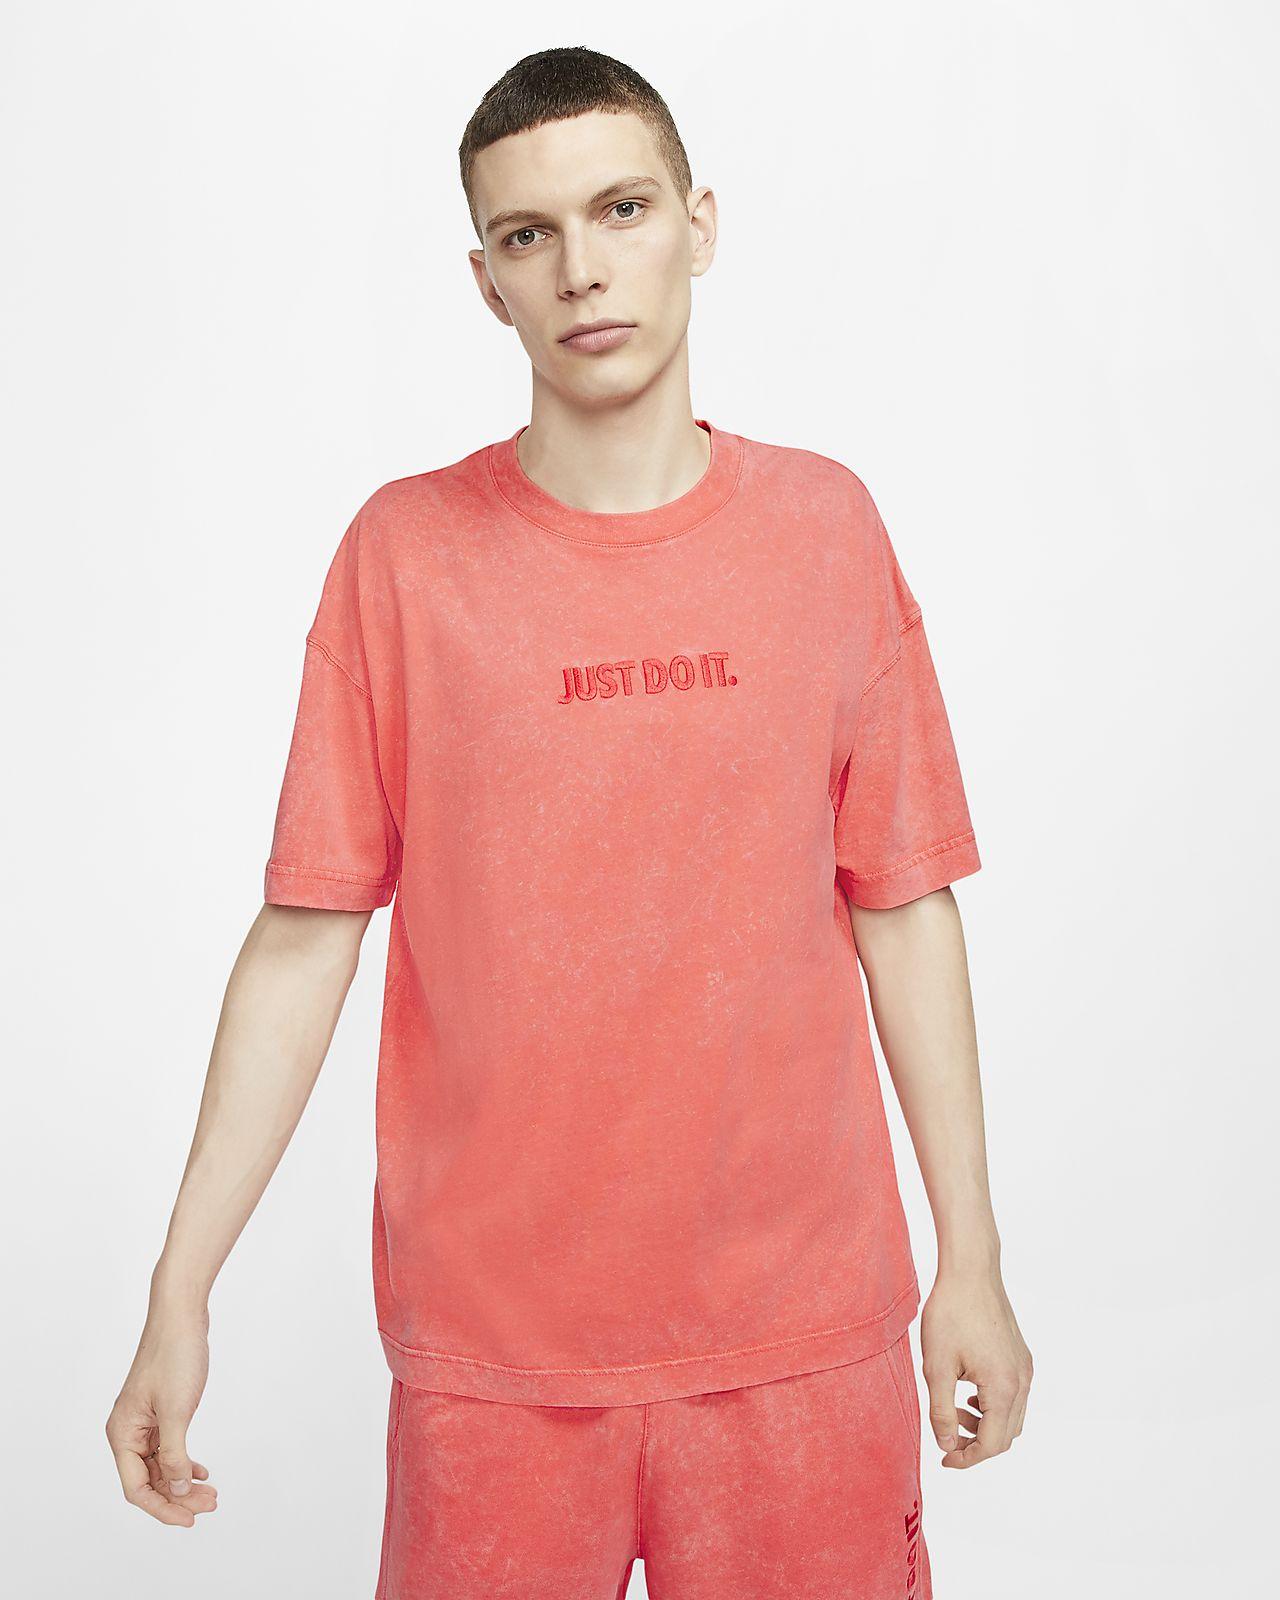 Tee-shirt Nike Sportswear JDI pour Homme